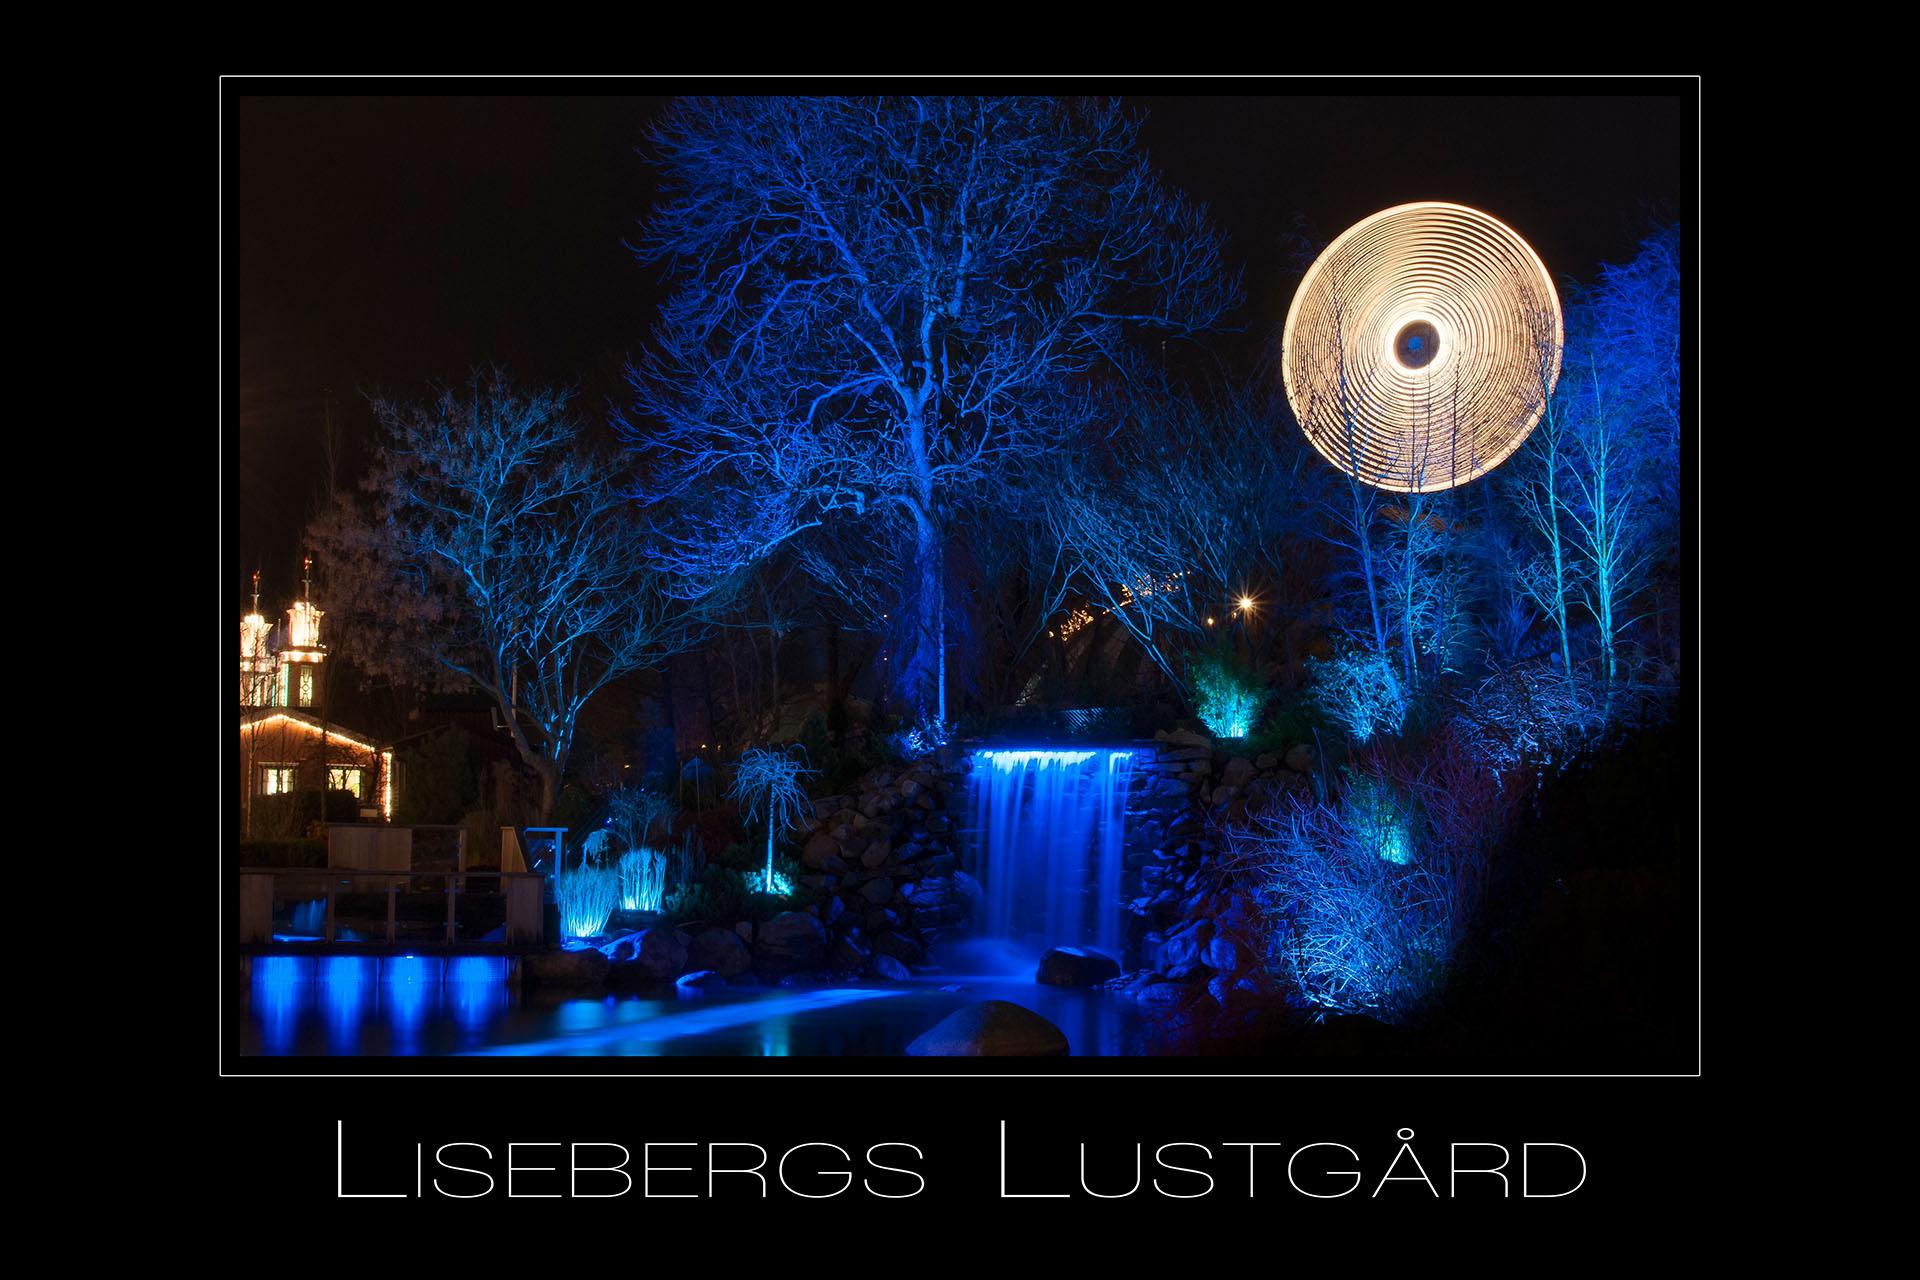 Landschaftsfotografie Lisebergs Lustgard in Goetheborg Schweden